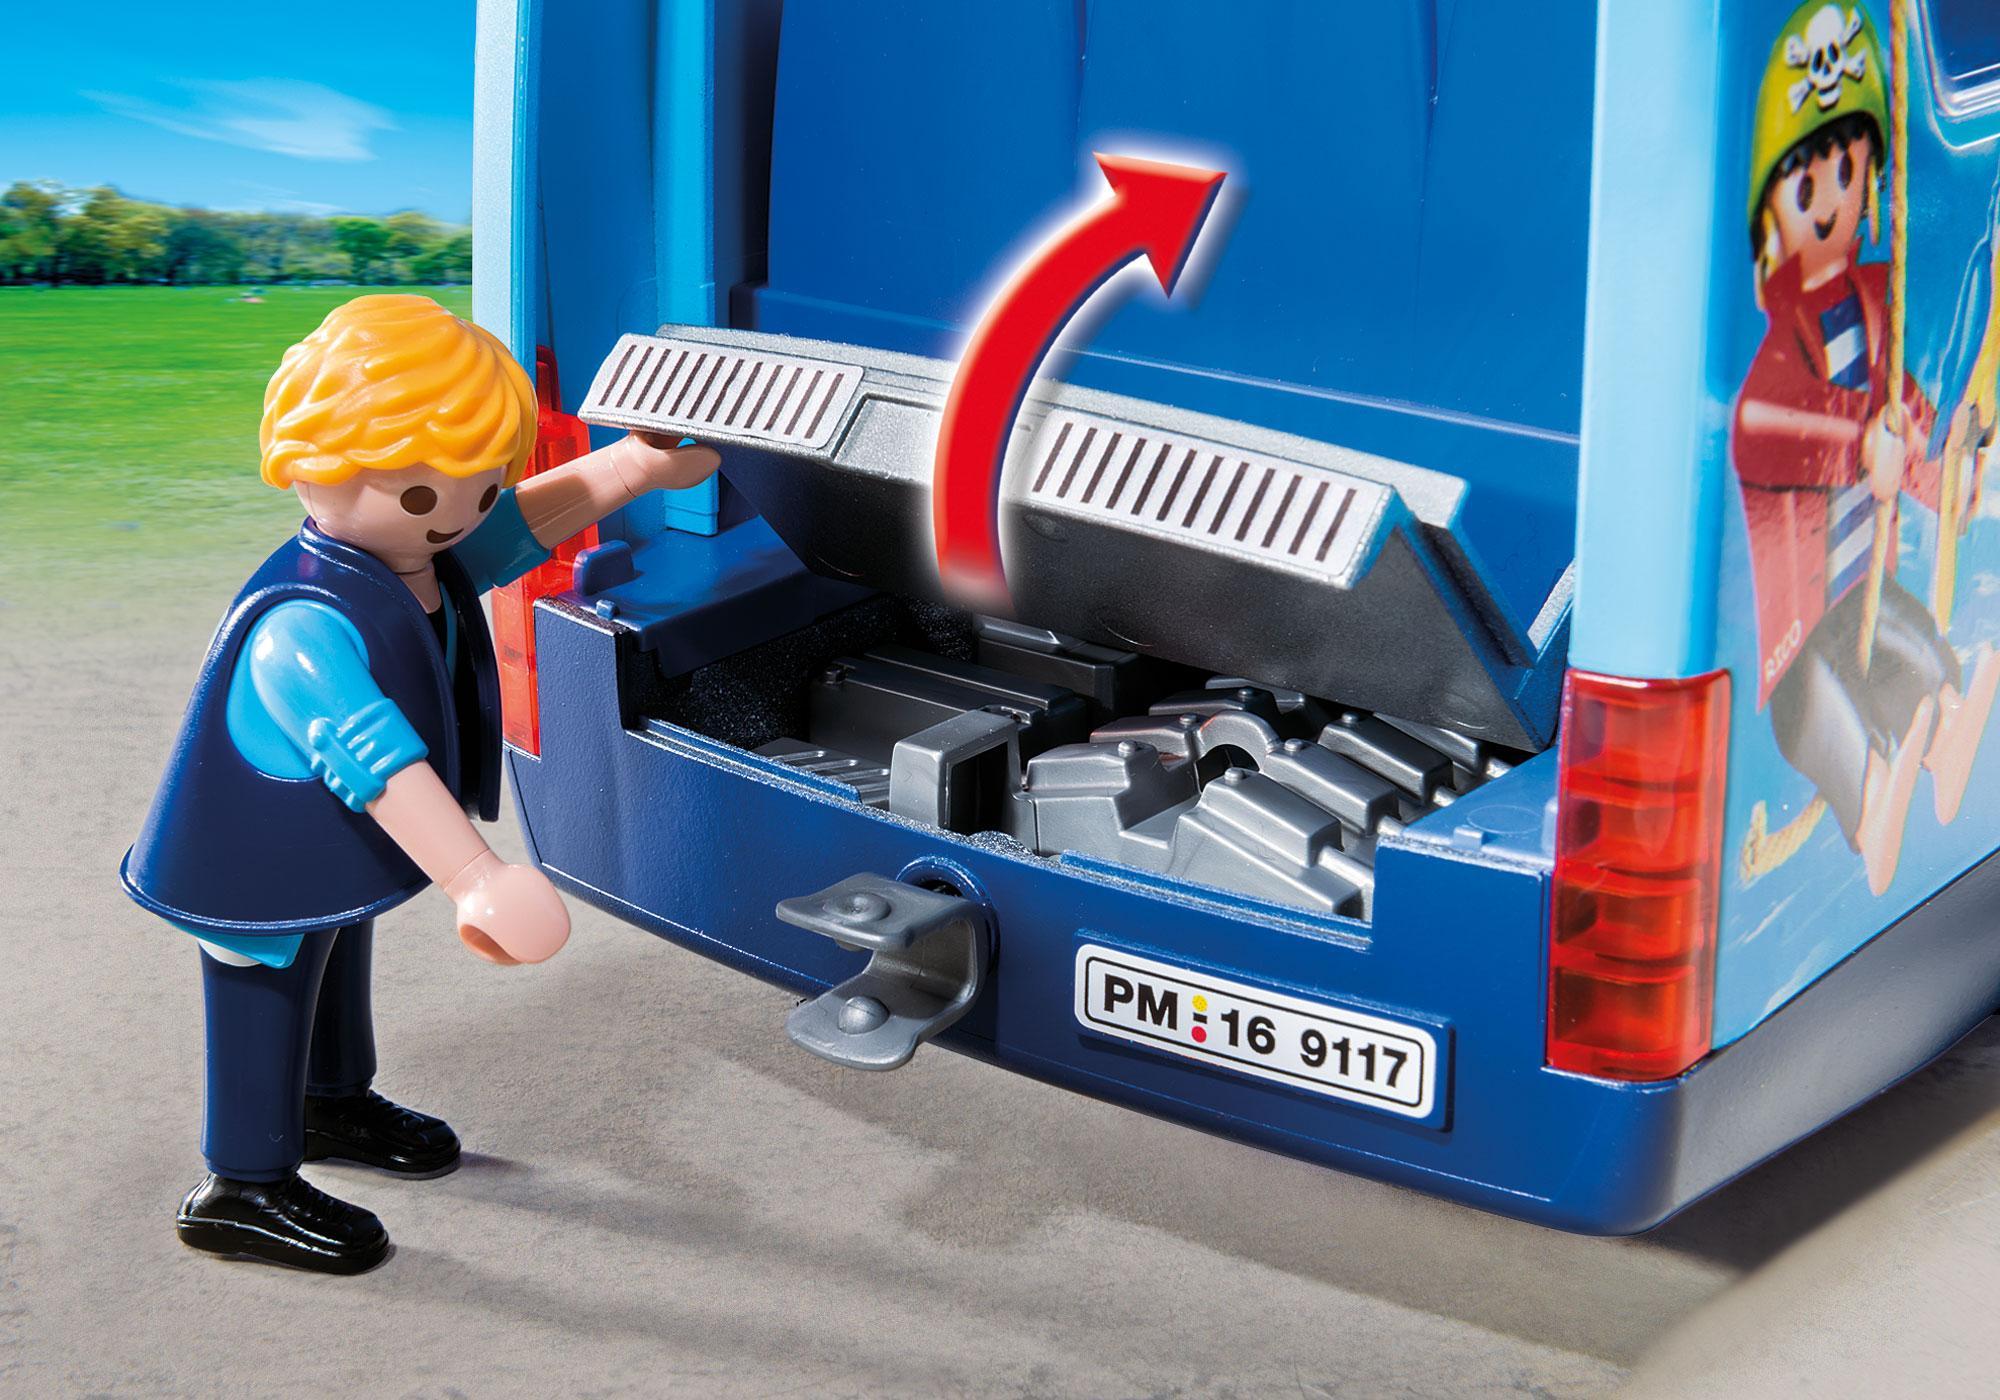 http://media.playmobil.com/i/playmobil/9117_product_extra4/PLAYMOBIL-FunPark skolebus